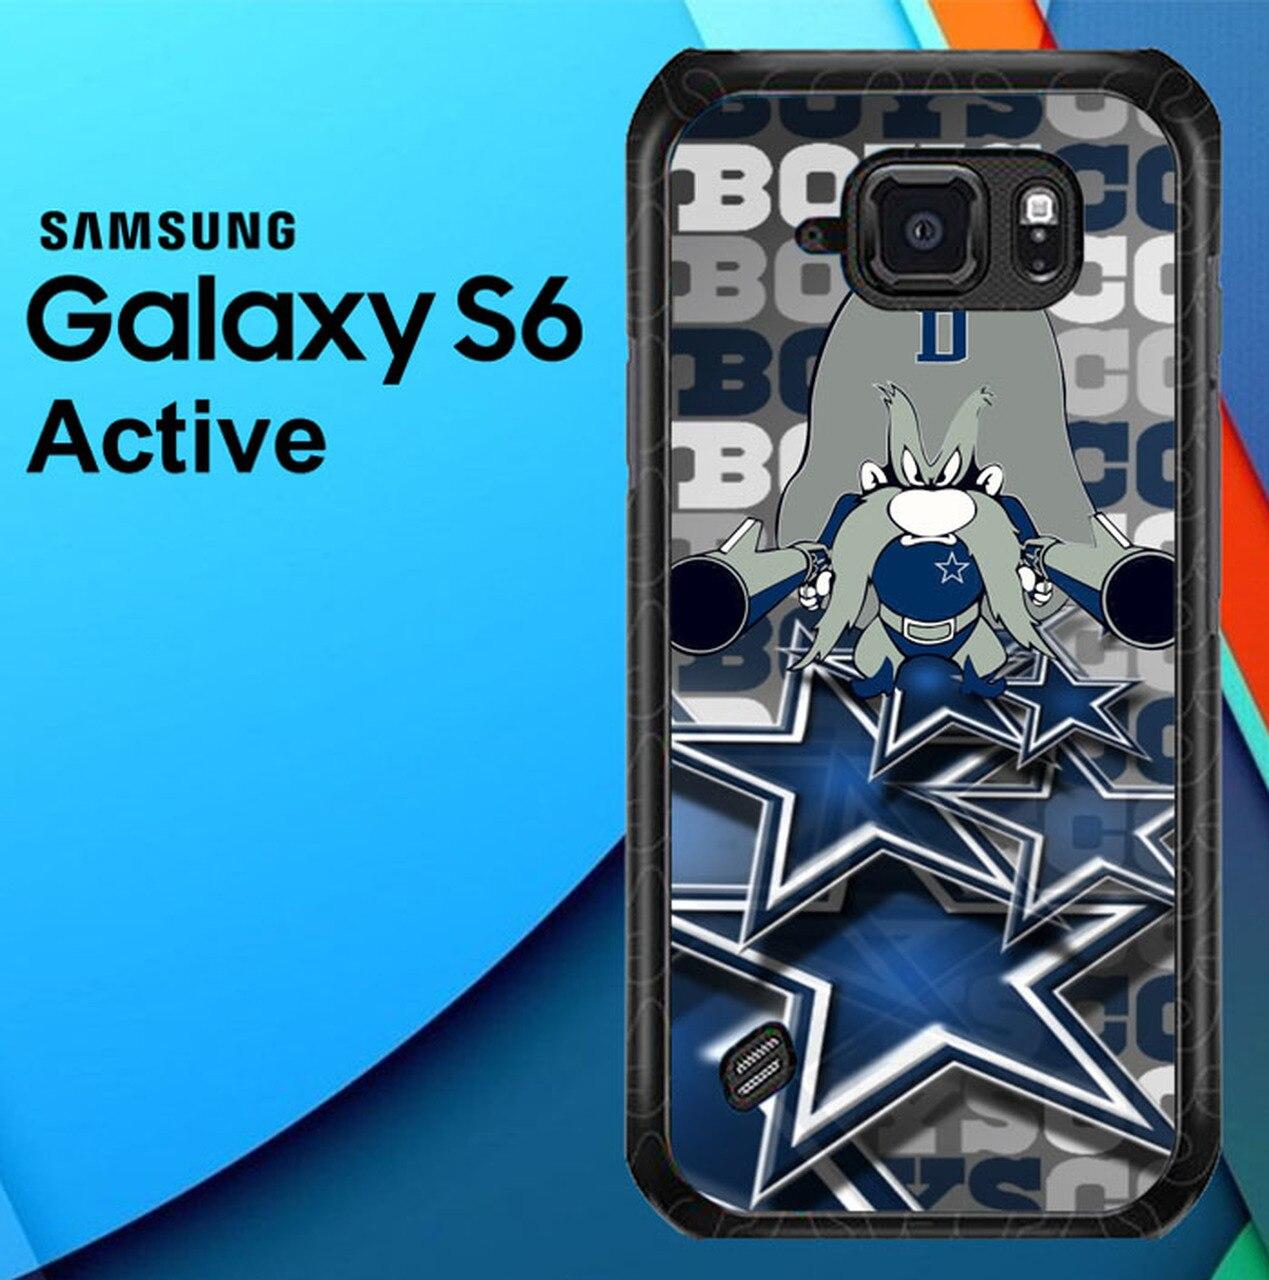 Dallas Cowboys Wallpaper For Phone - HD Wallpaper